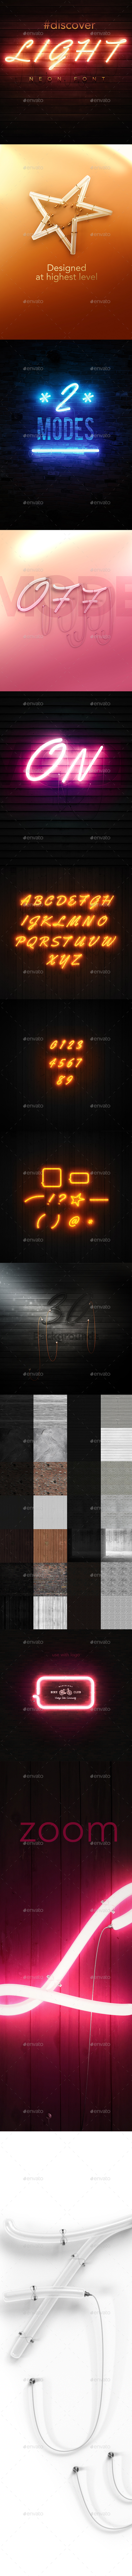 PSD Neon Font Mock-up - Logo Product Mock-Ups